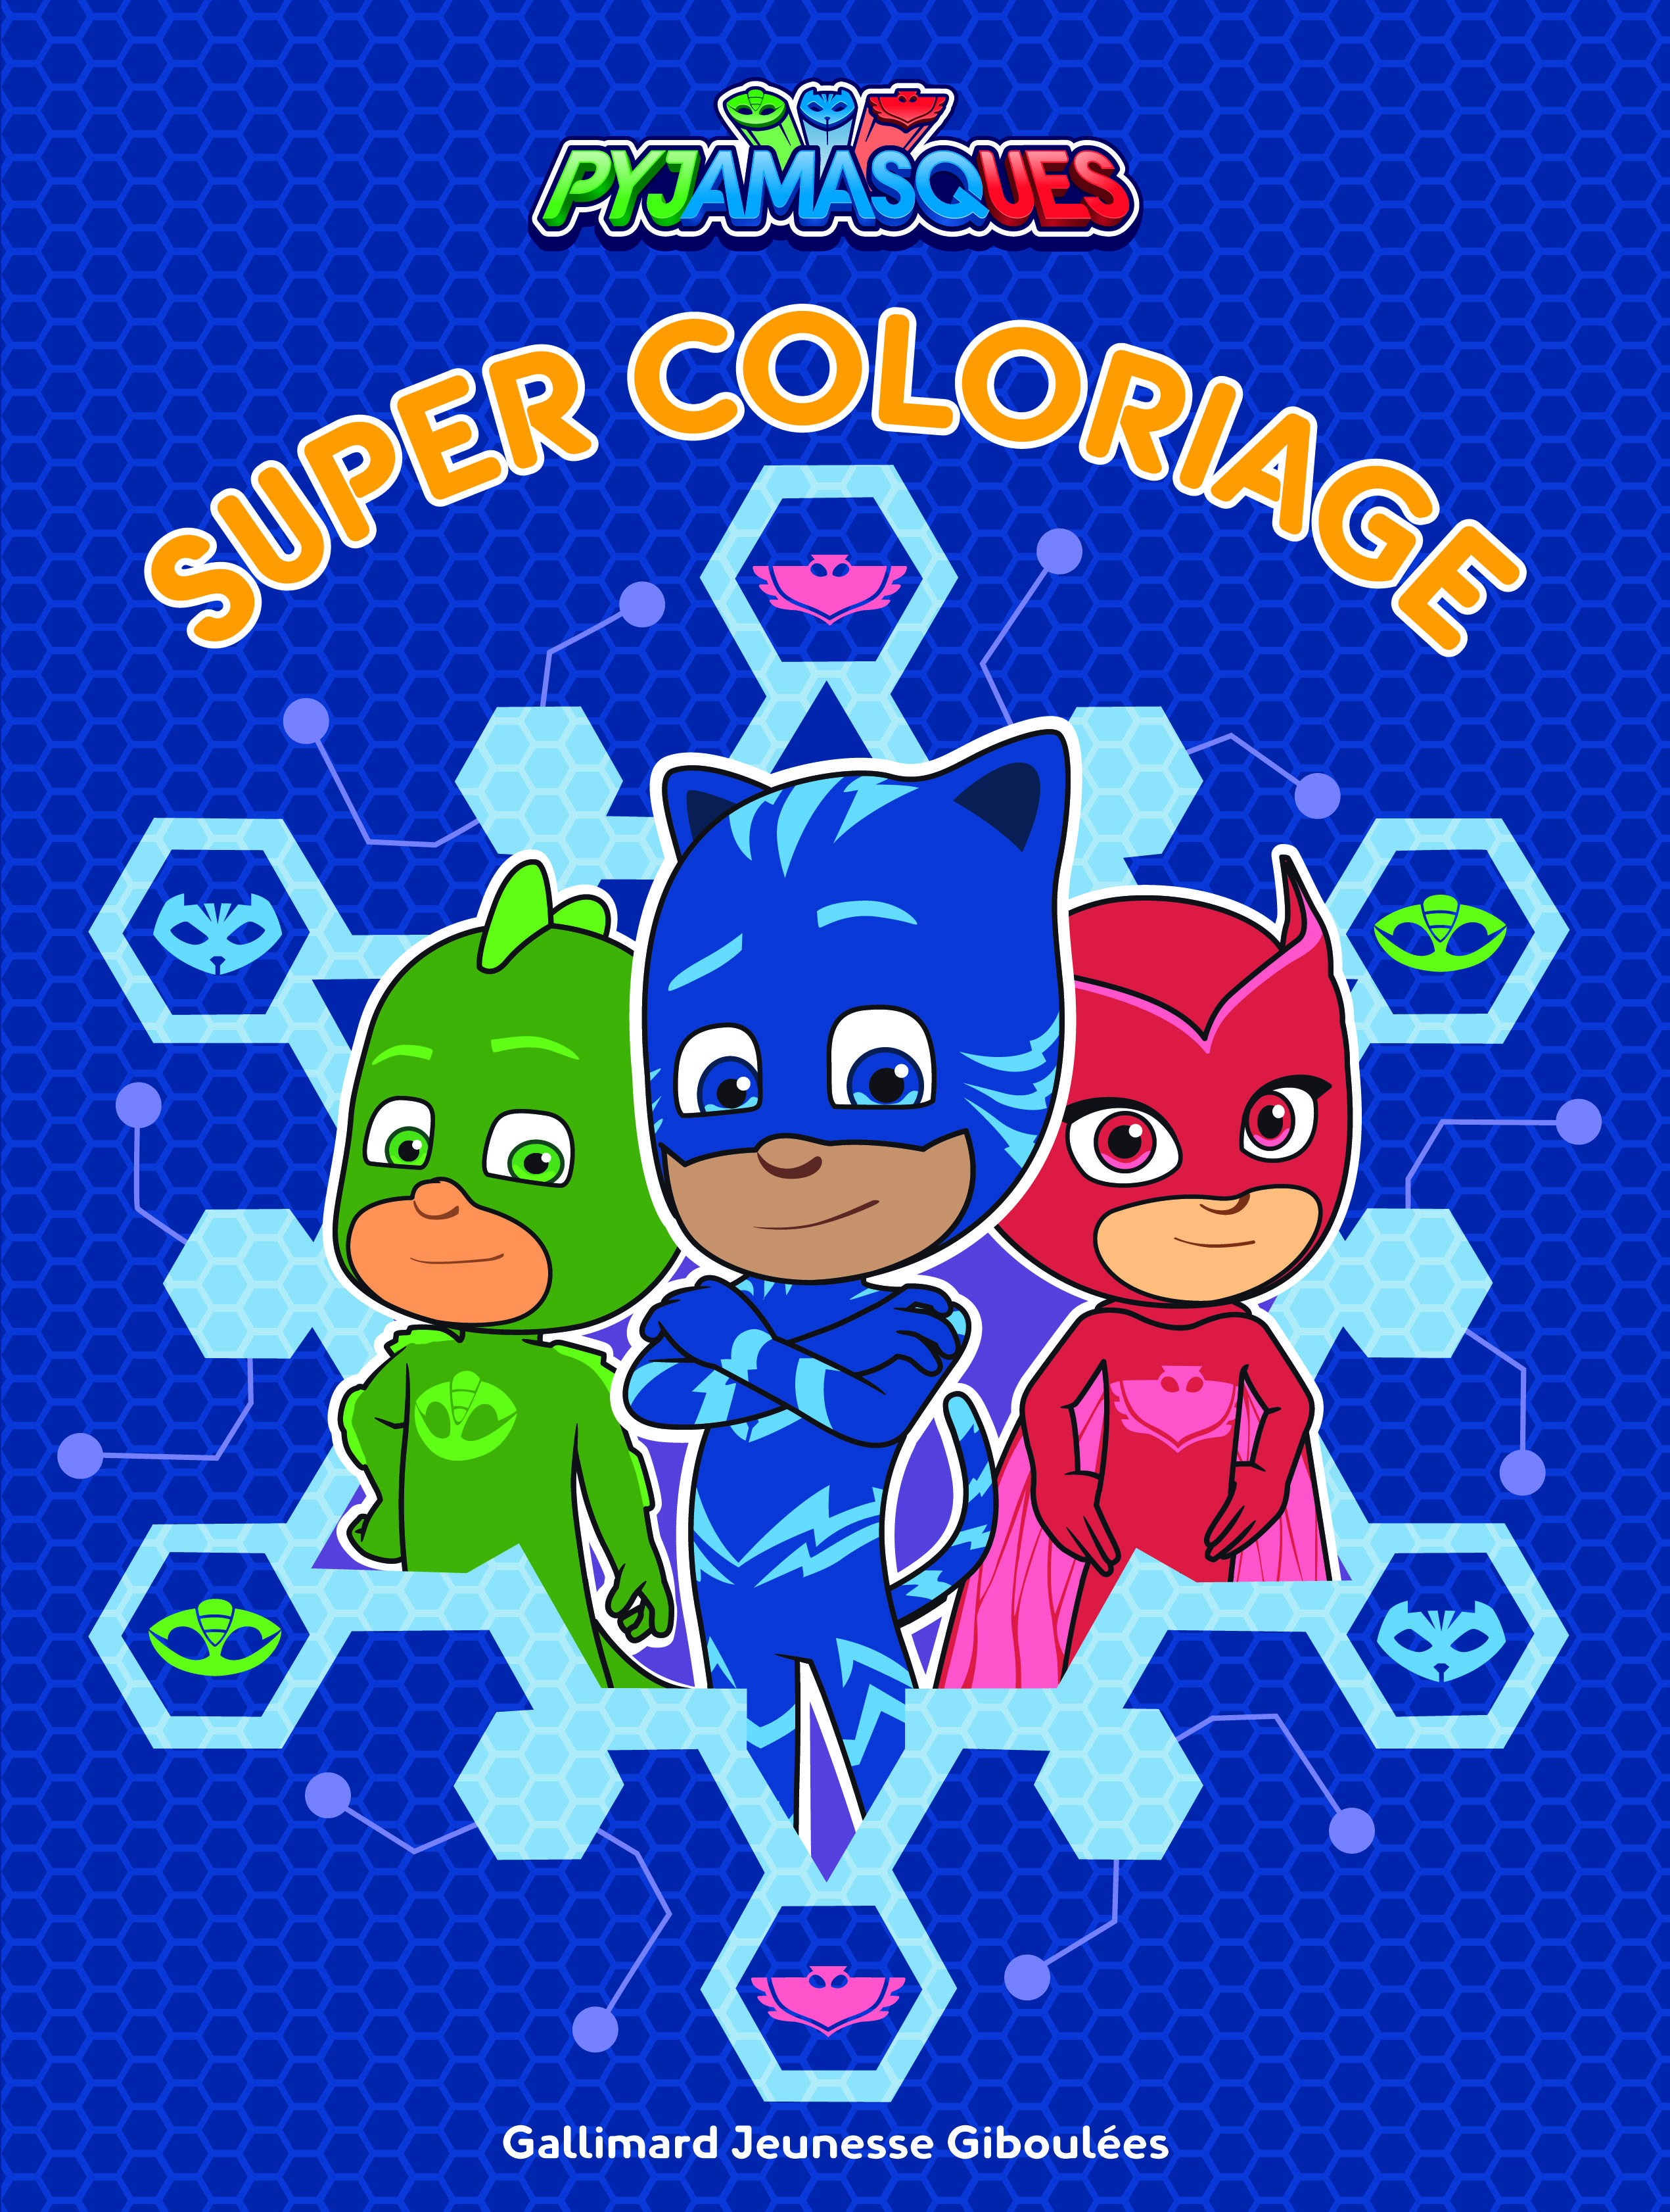 Super coloriage Pyjamasques